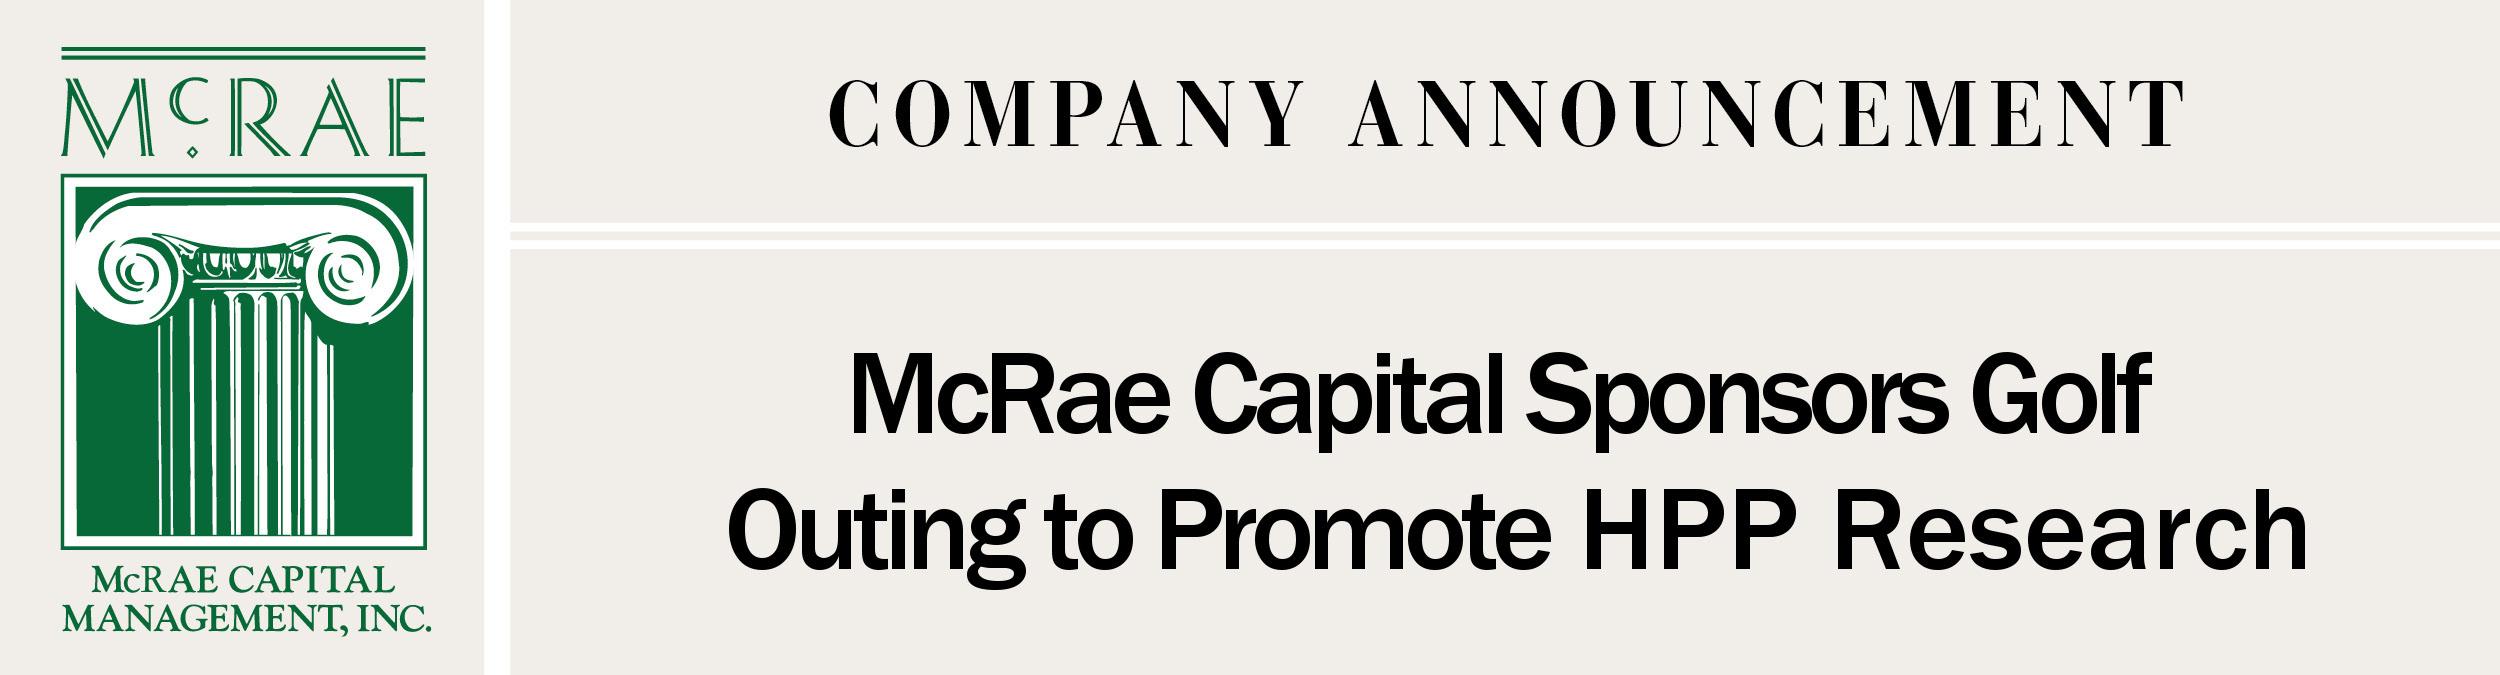 mcrae_email-header_company-announcement_soft-bones-2016